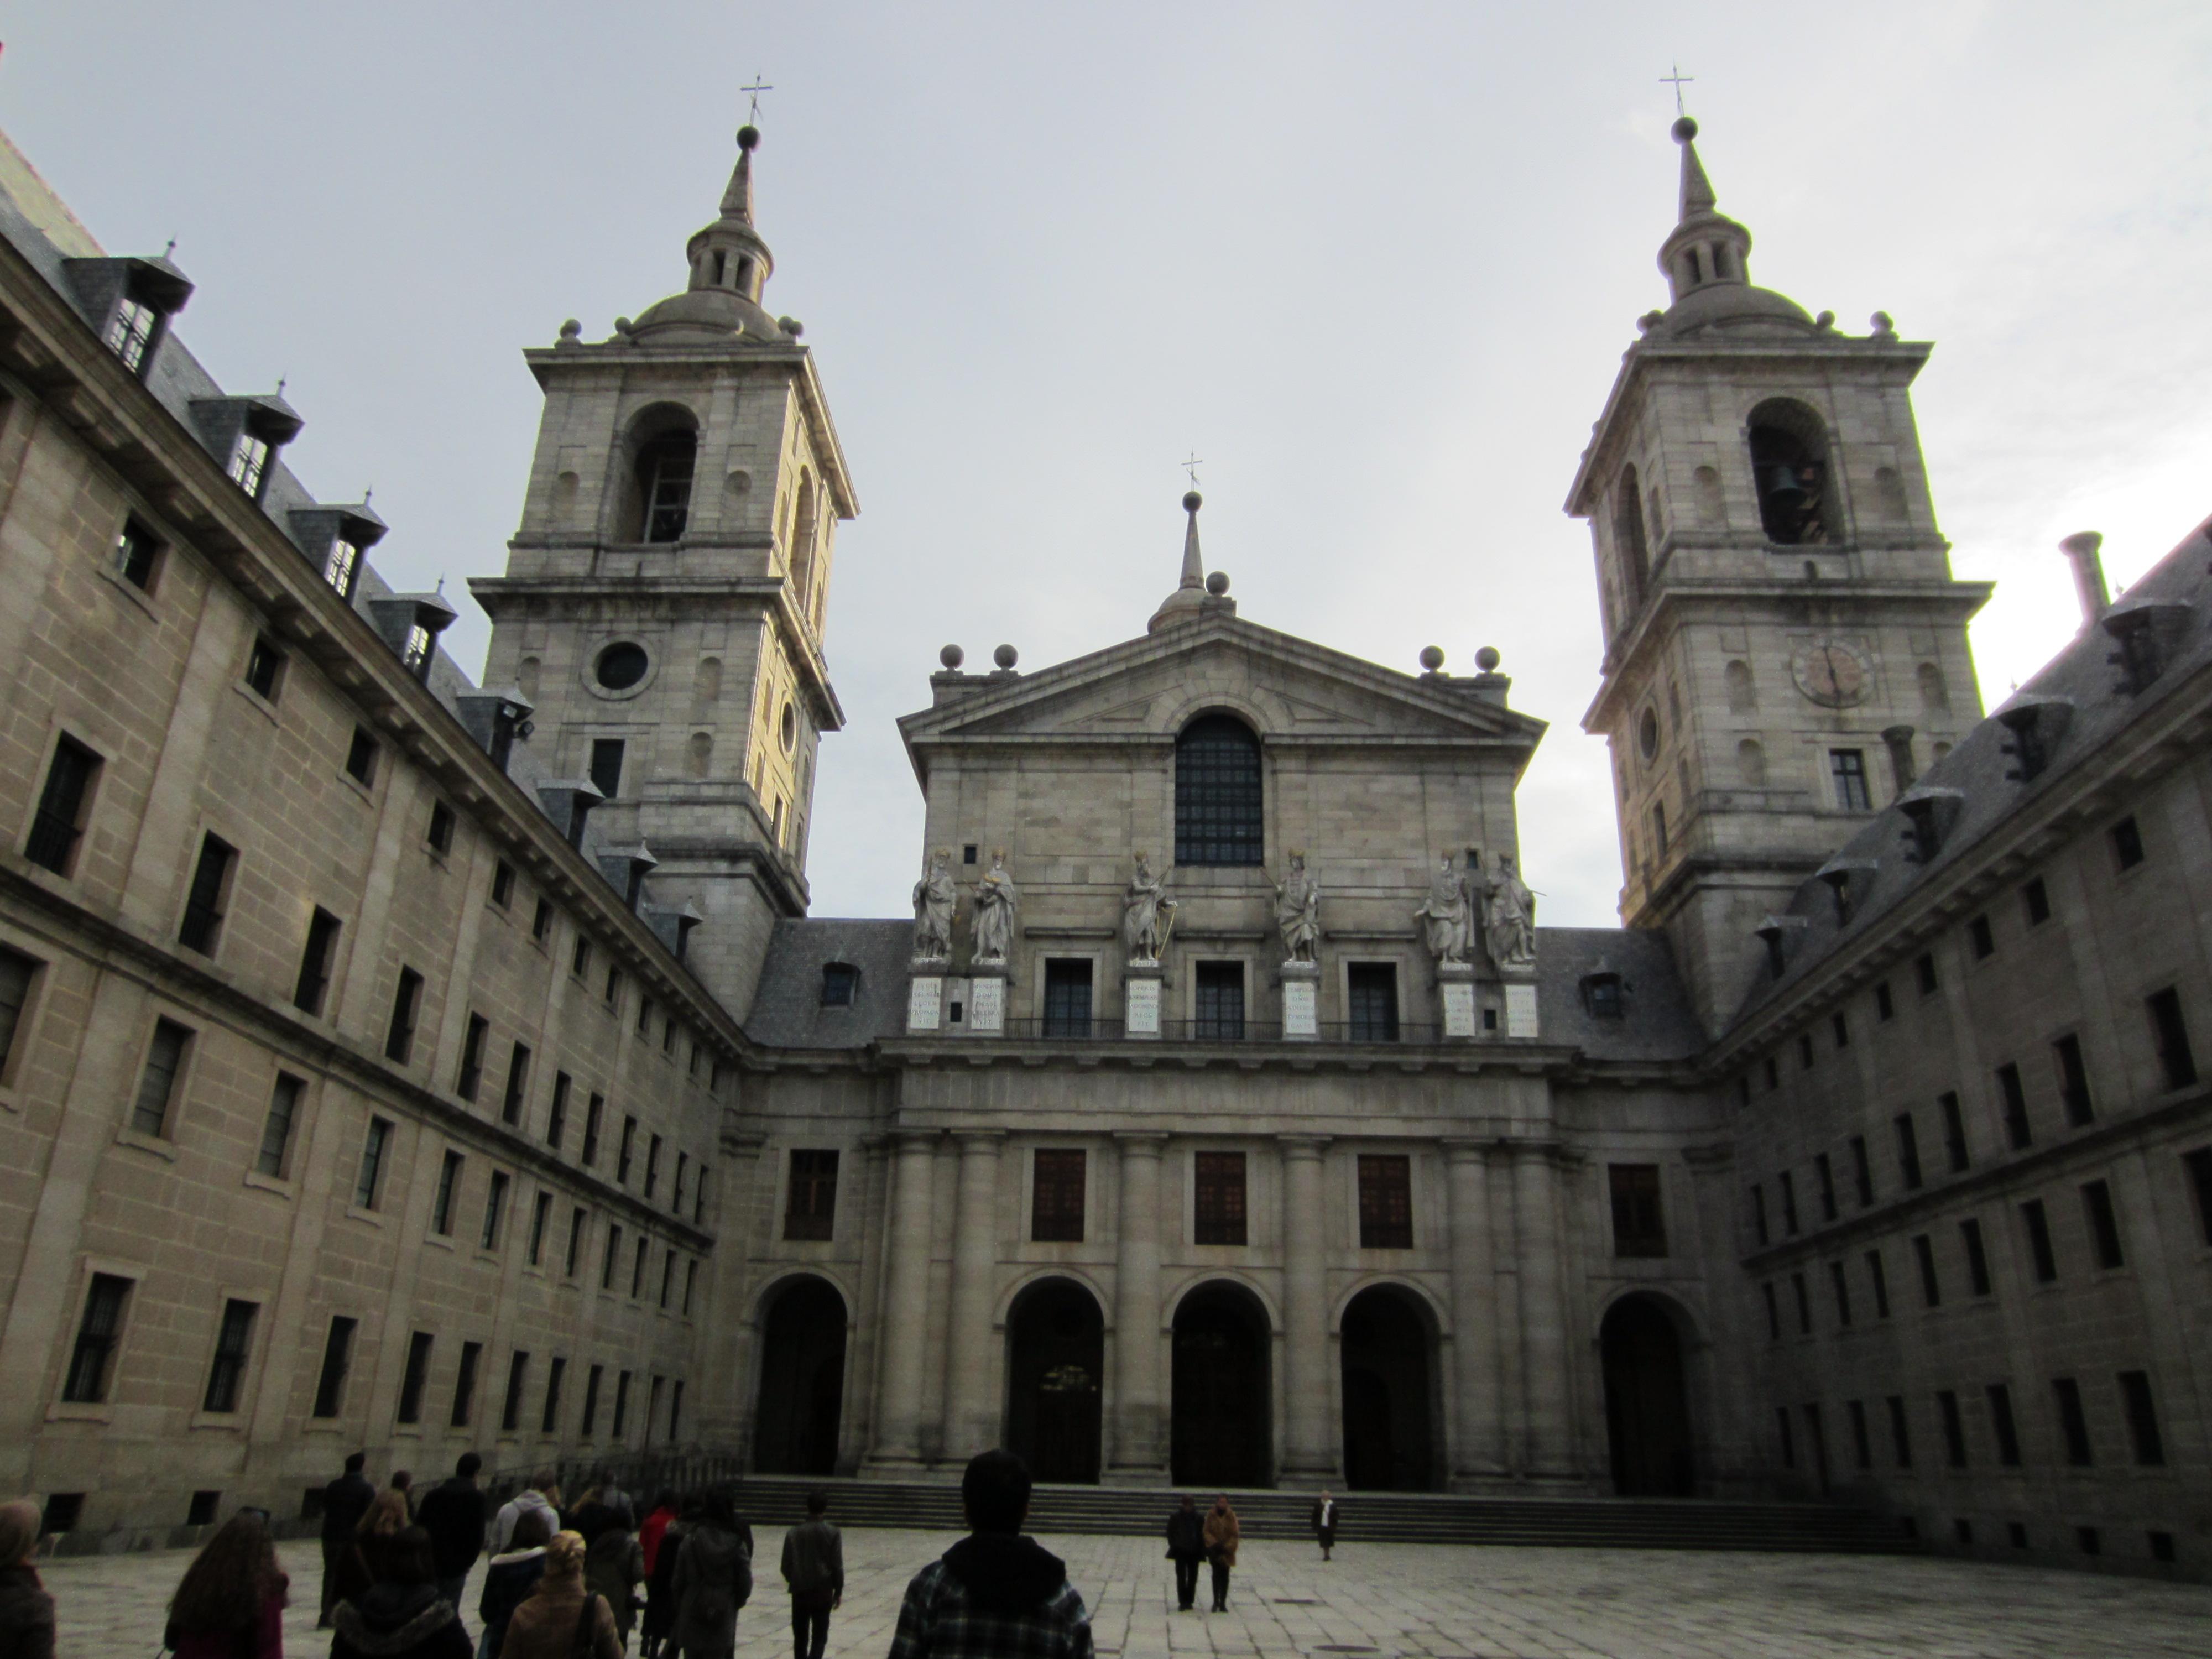 Temple University in Spain